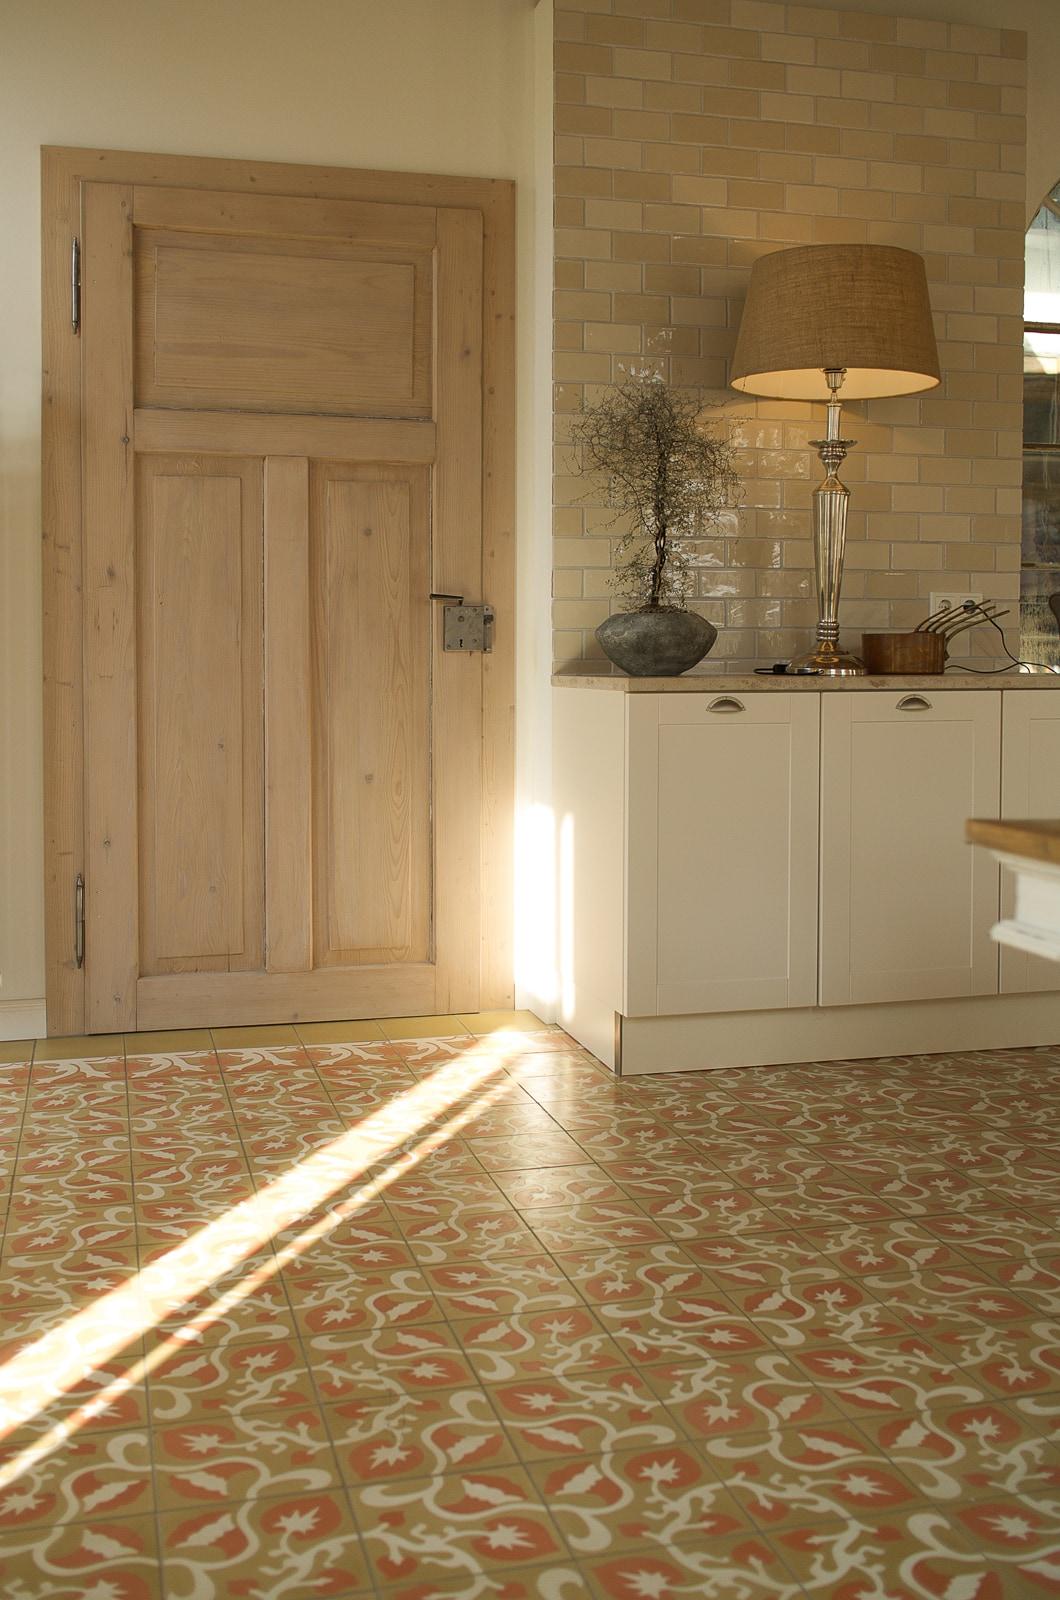 Zementmosaikplatten-musternummer-13200-hotel-02-via-gmbh | 13200